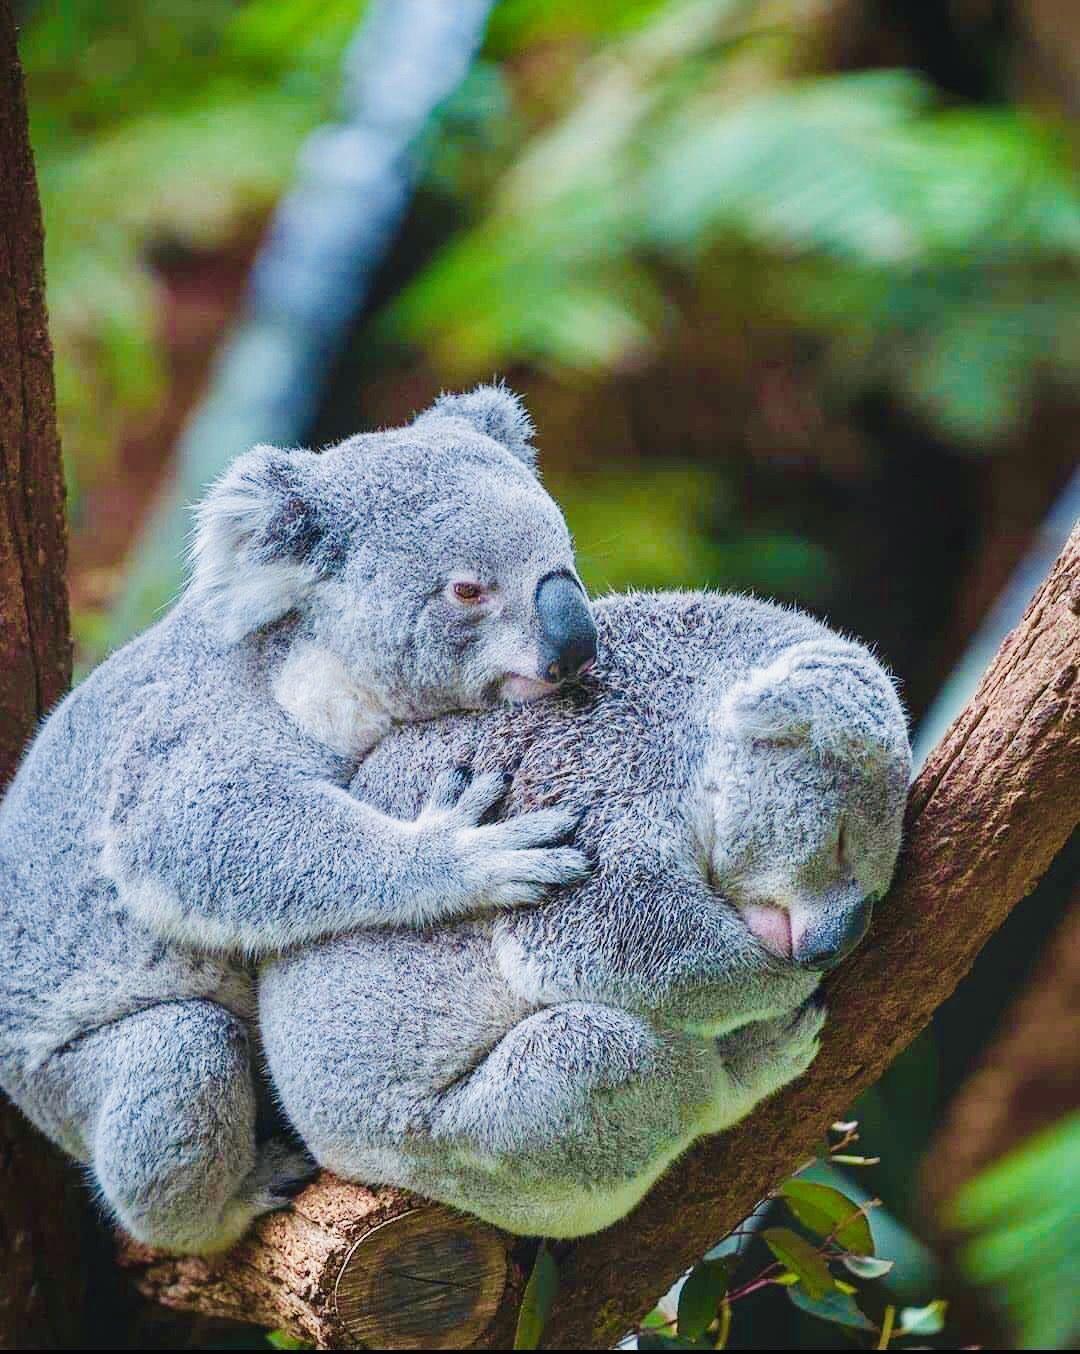 in 2020 | Koala, Koala bear, Cute animals - photo#23